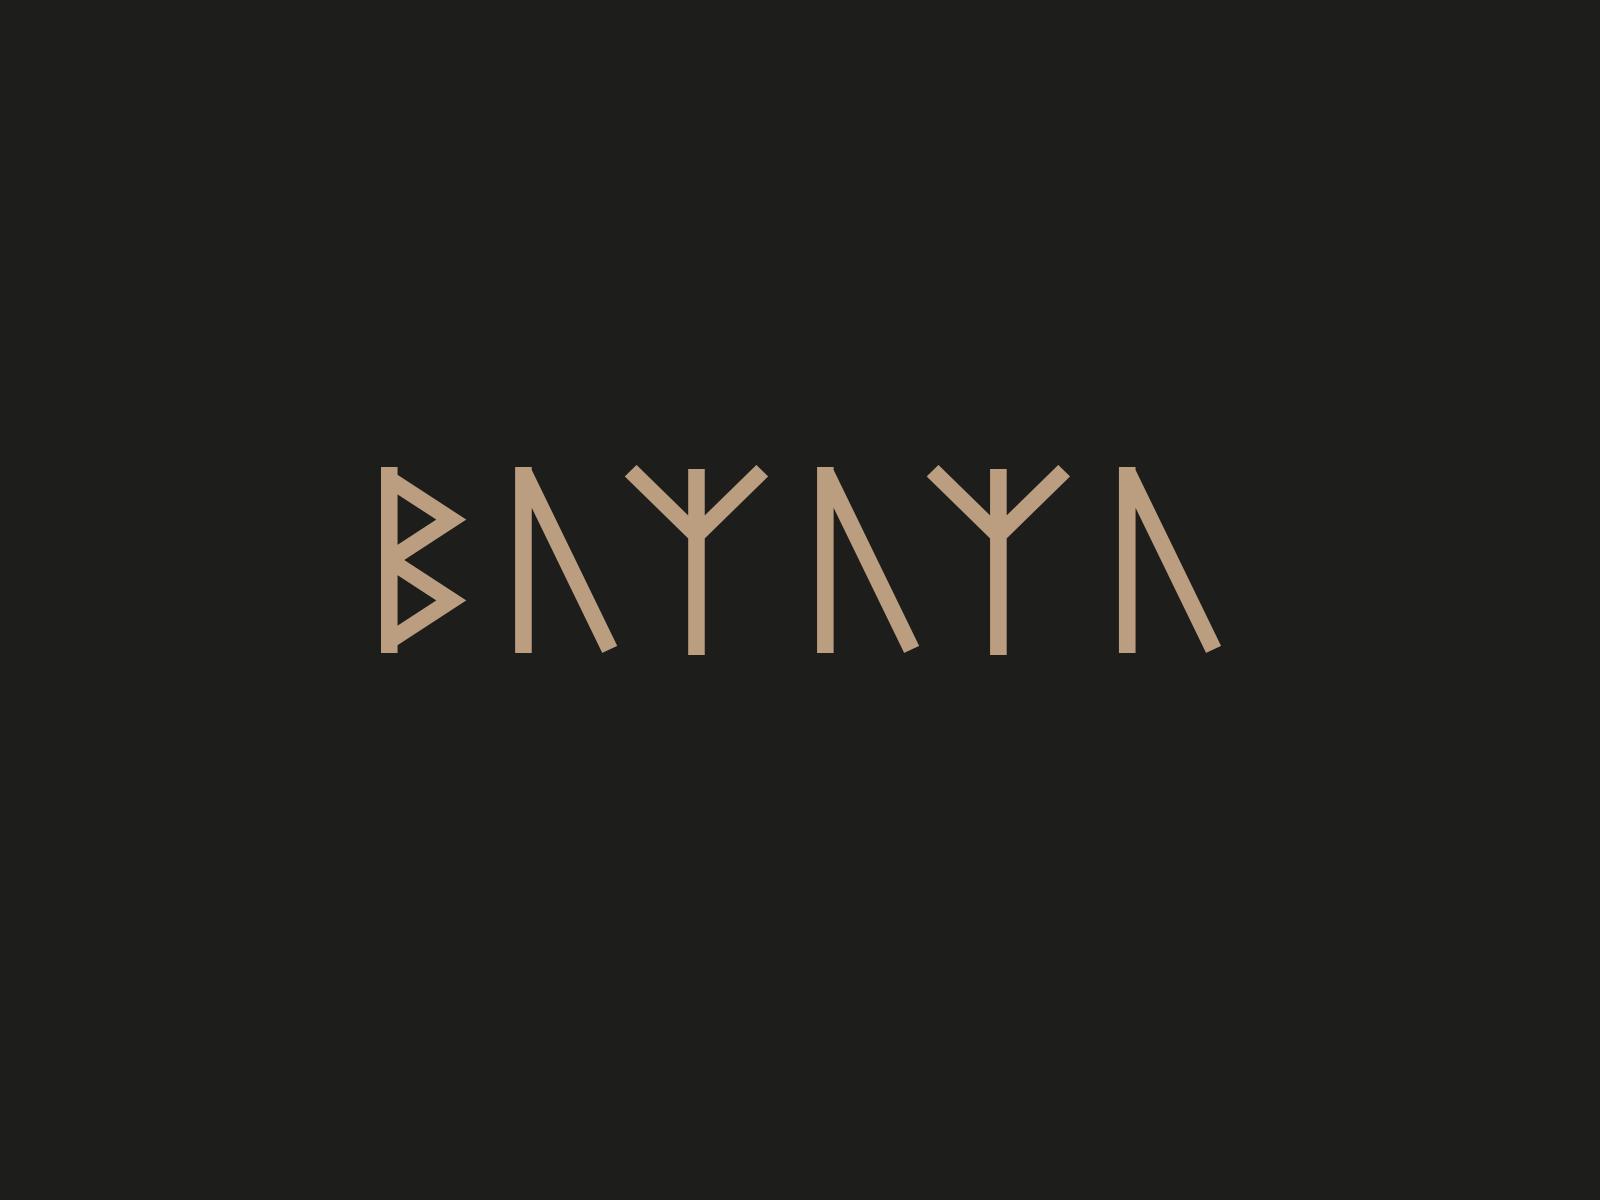 Bayaya Logotype